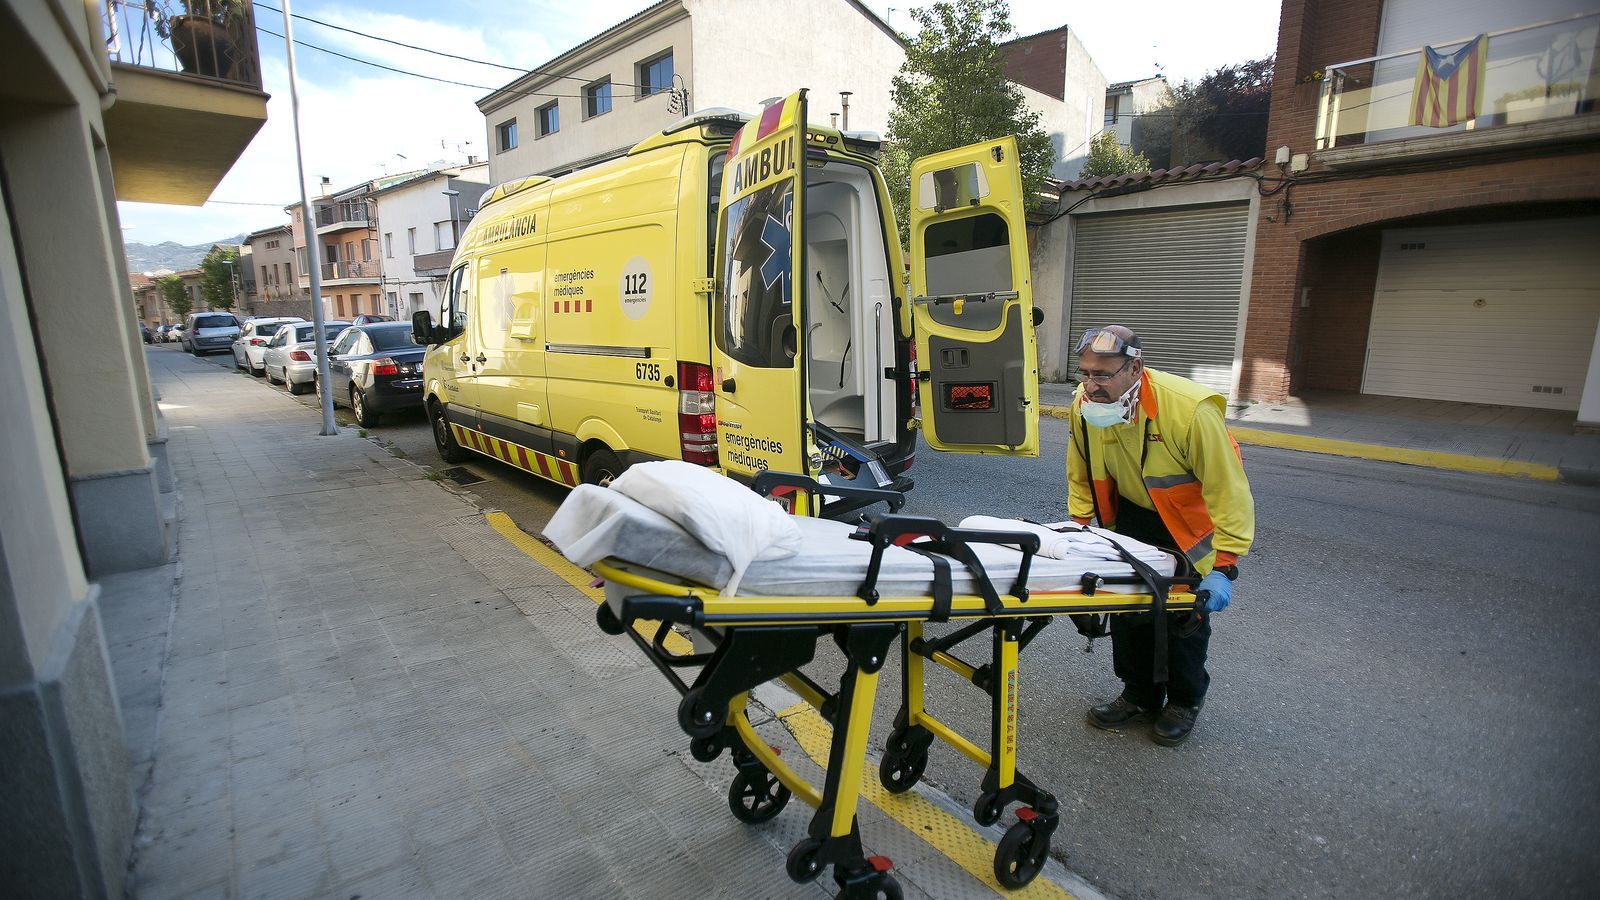 Un tècnic d'ambulància amb una llitera per fer un trasllat